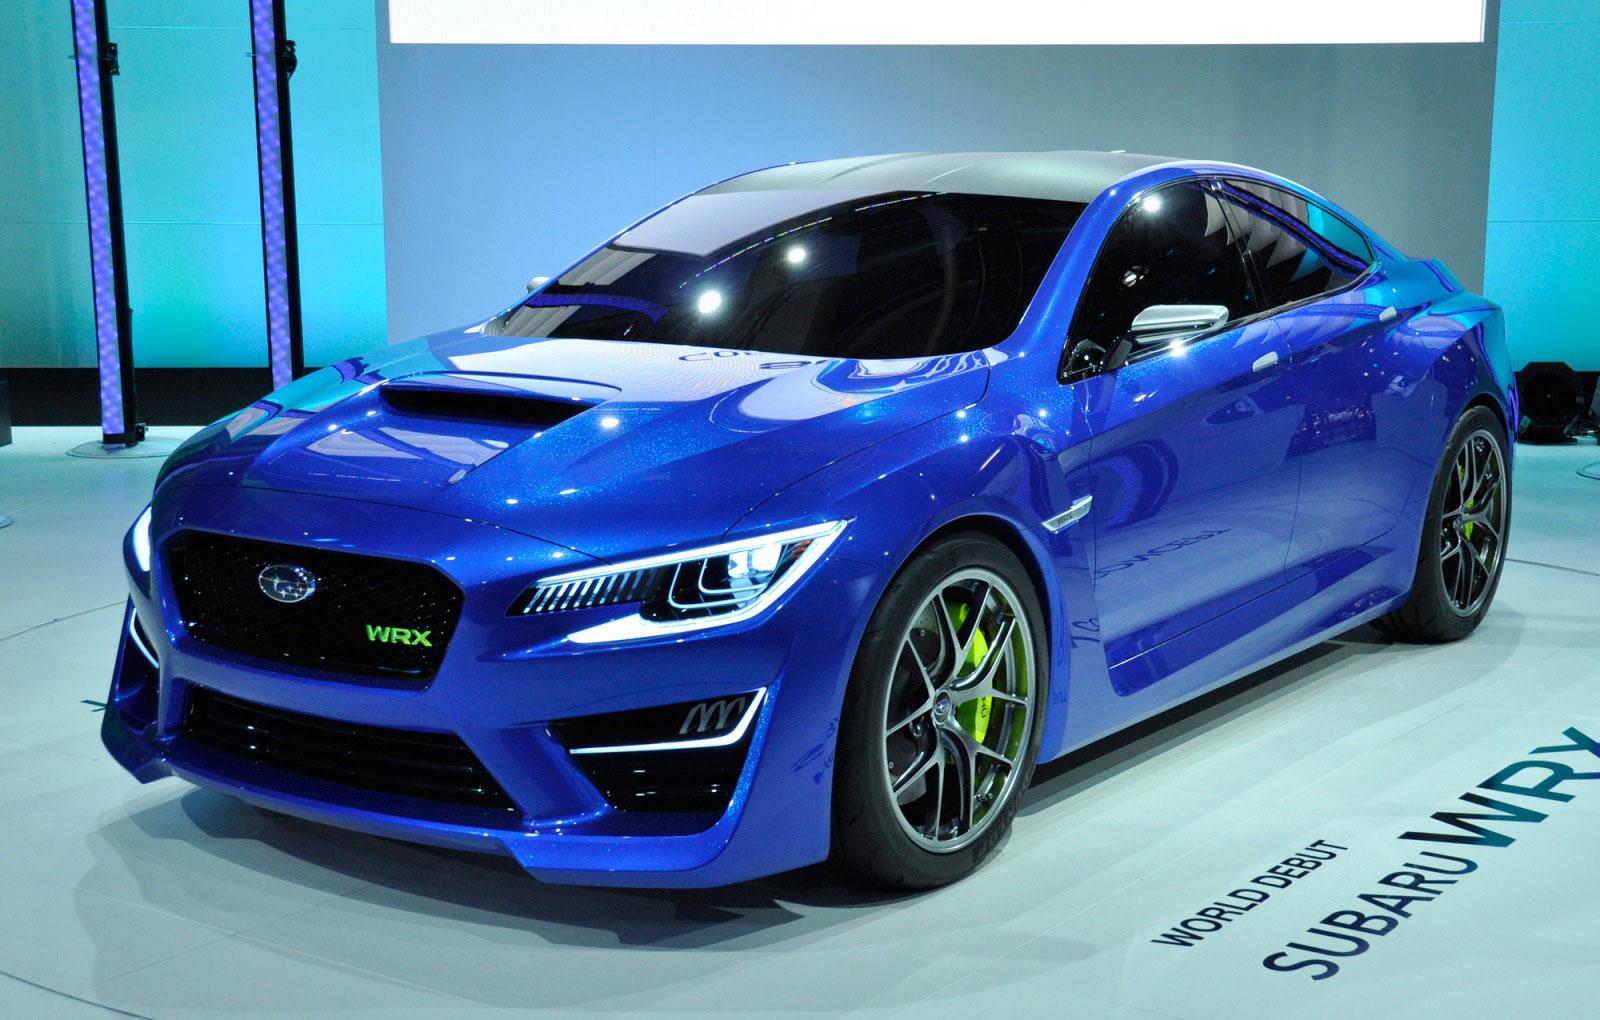 Subaru 2016 Subaru WRX STI Concept Design HD Wallpaper 2016 Subaru 1600x1020